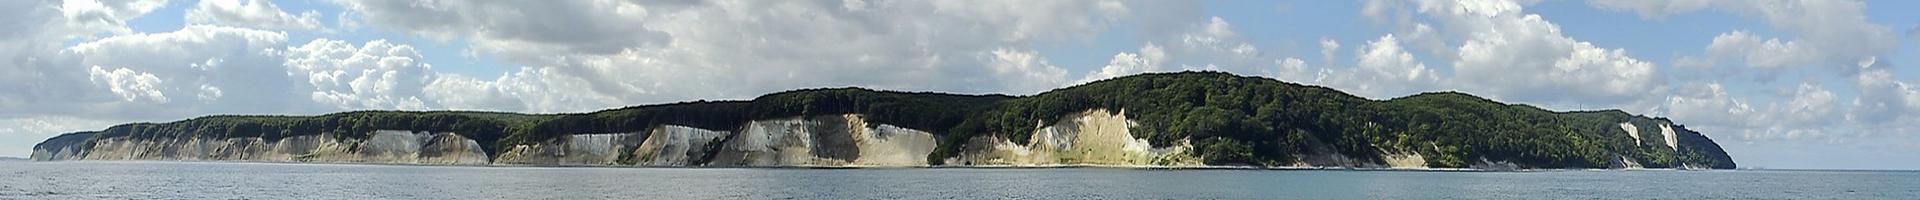 Inseln - Web-Vorpommern.de